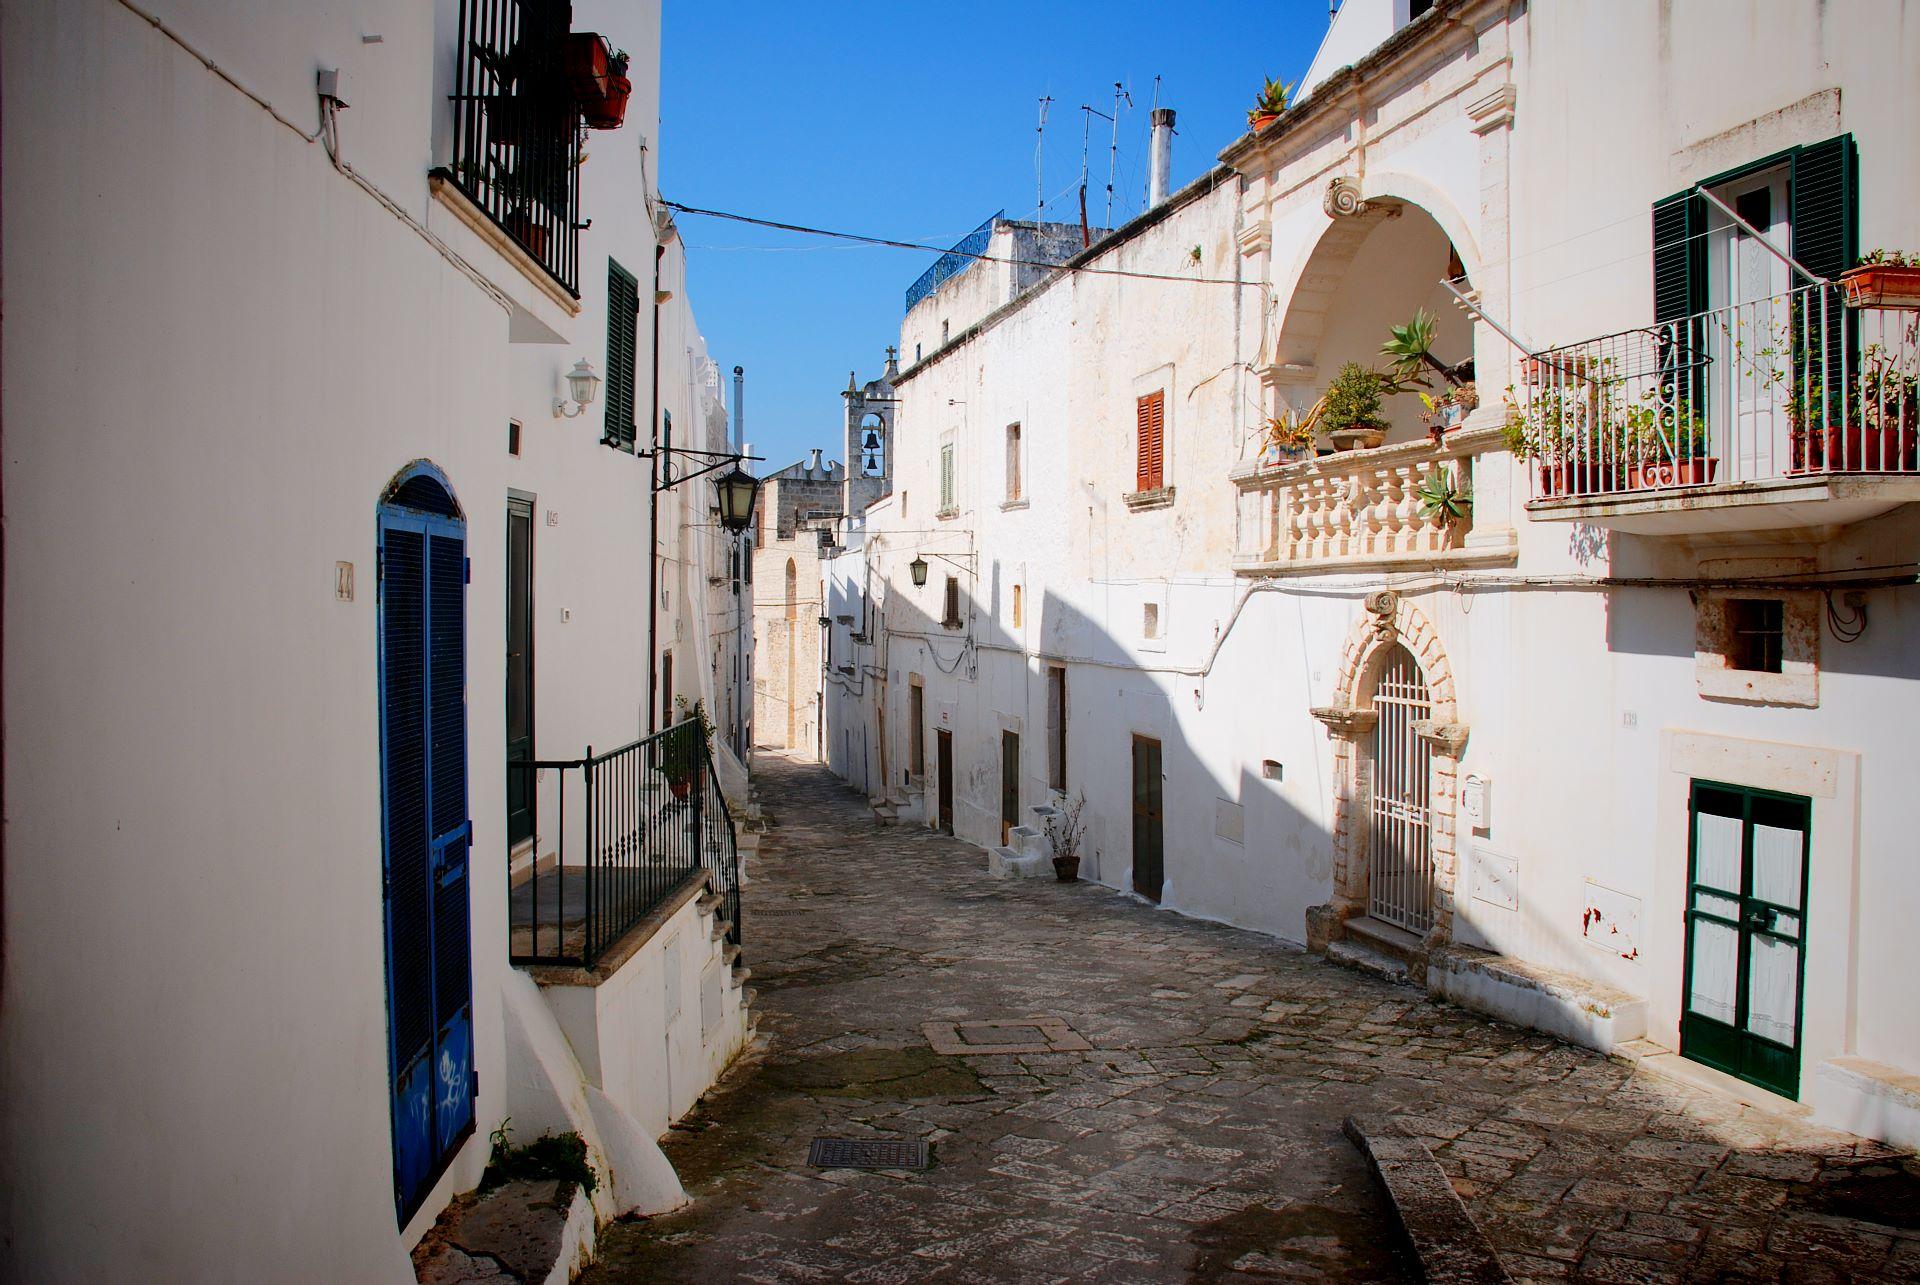 apulia-slow-travel-ostuni-citta bianca-white city-die weiße stadt-vicolo-salento-murgia-gasse-loggia-alley-valle-d'itria